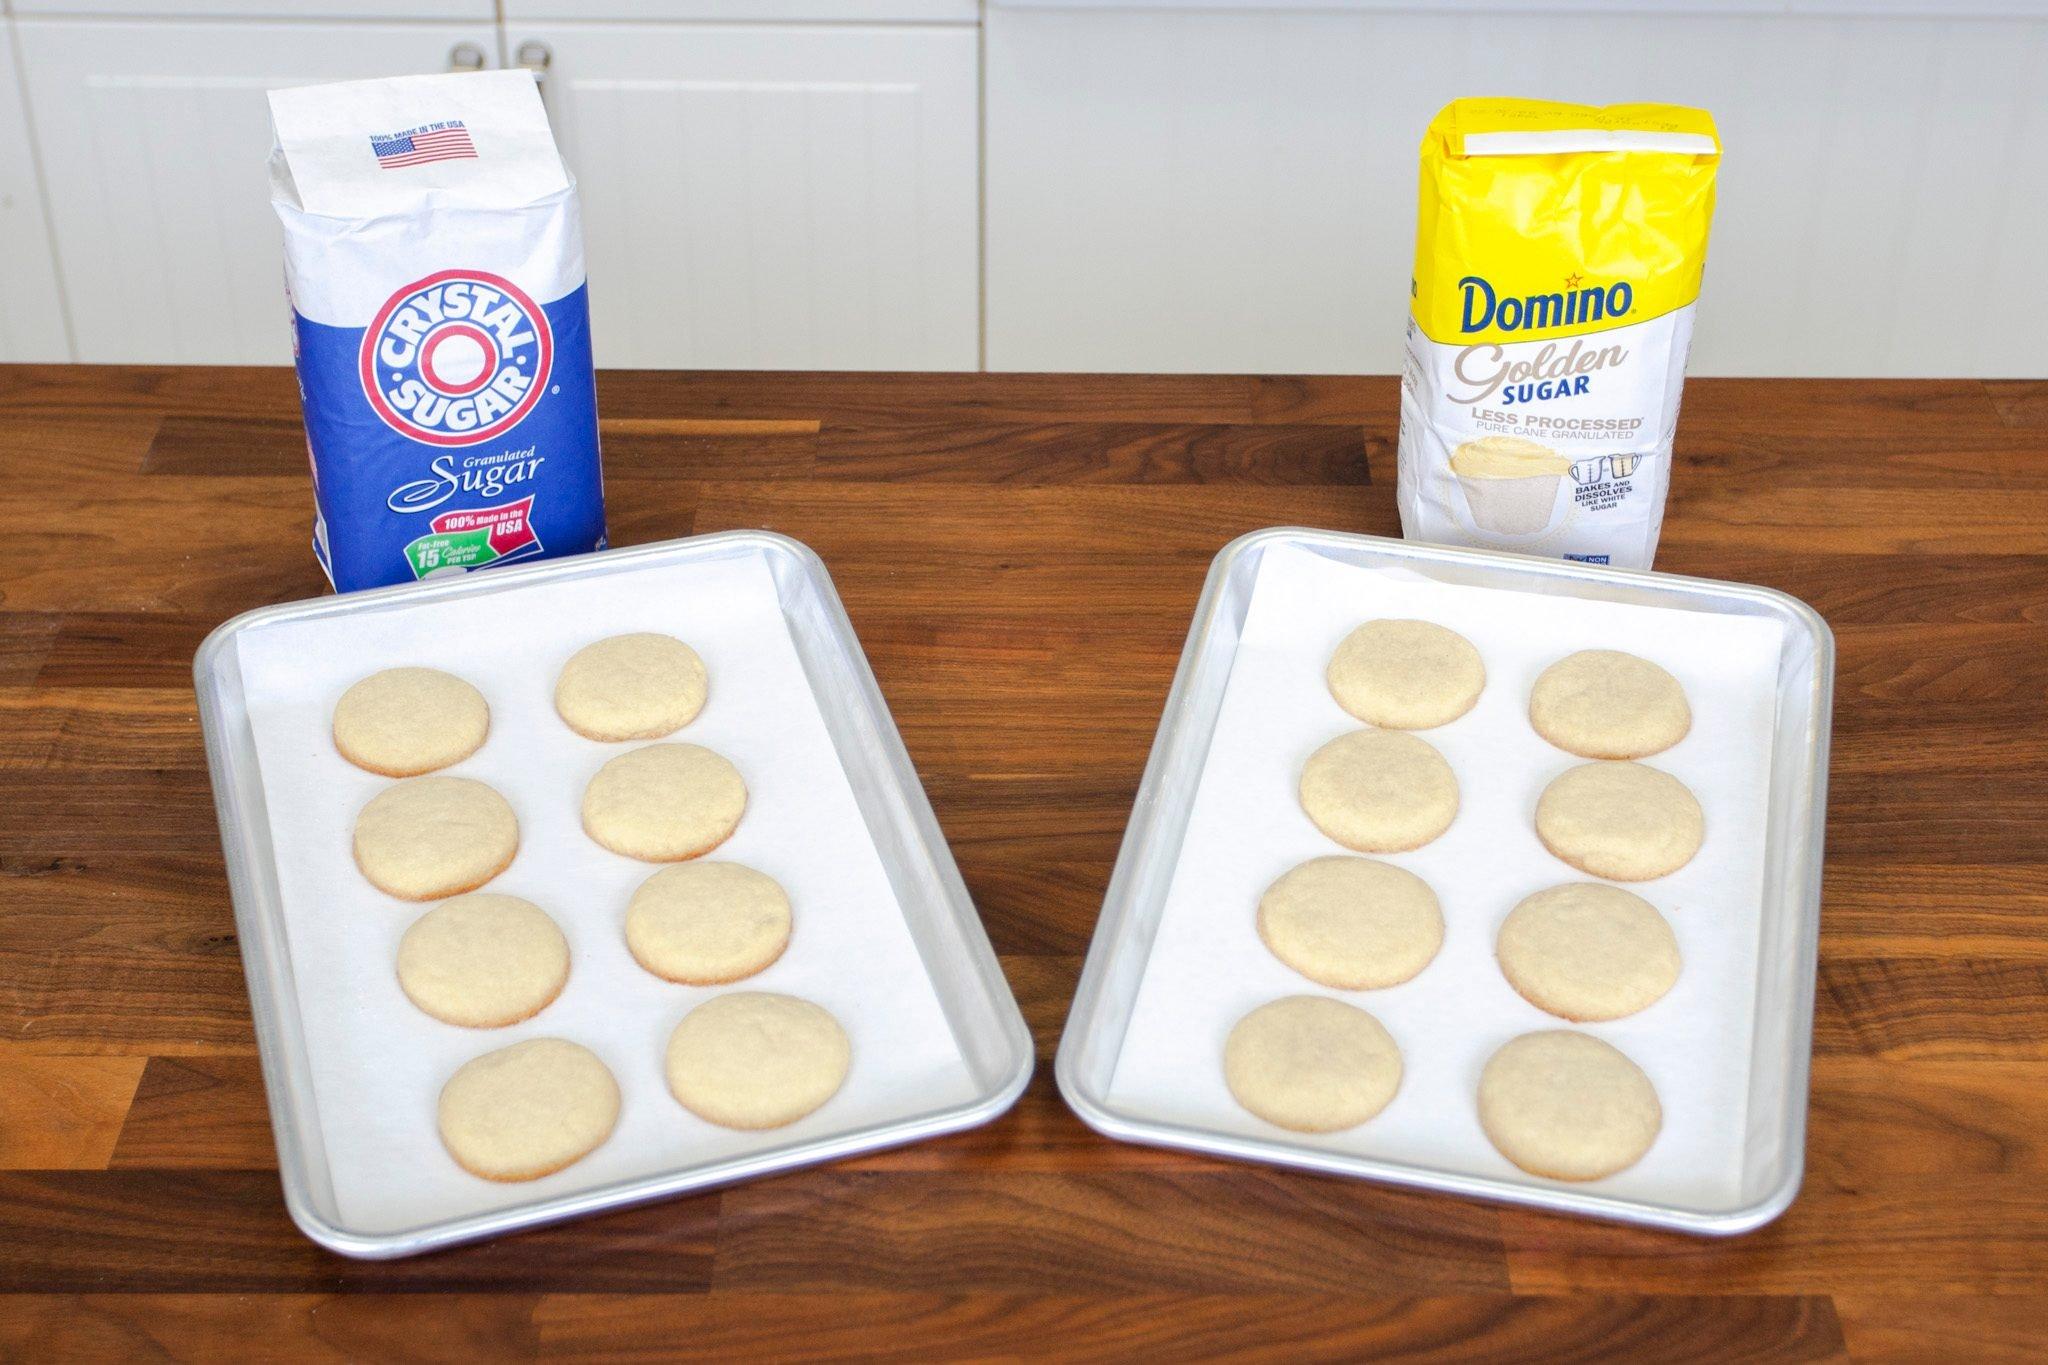 Domino's New Golden Sugar with Regular White Sugar